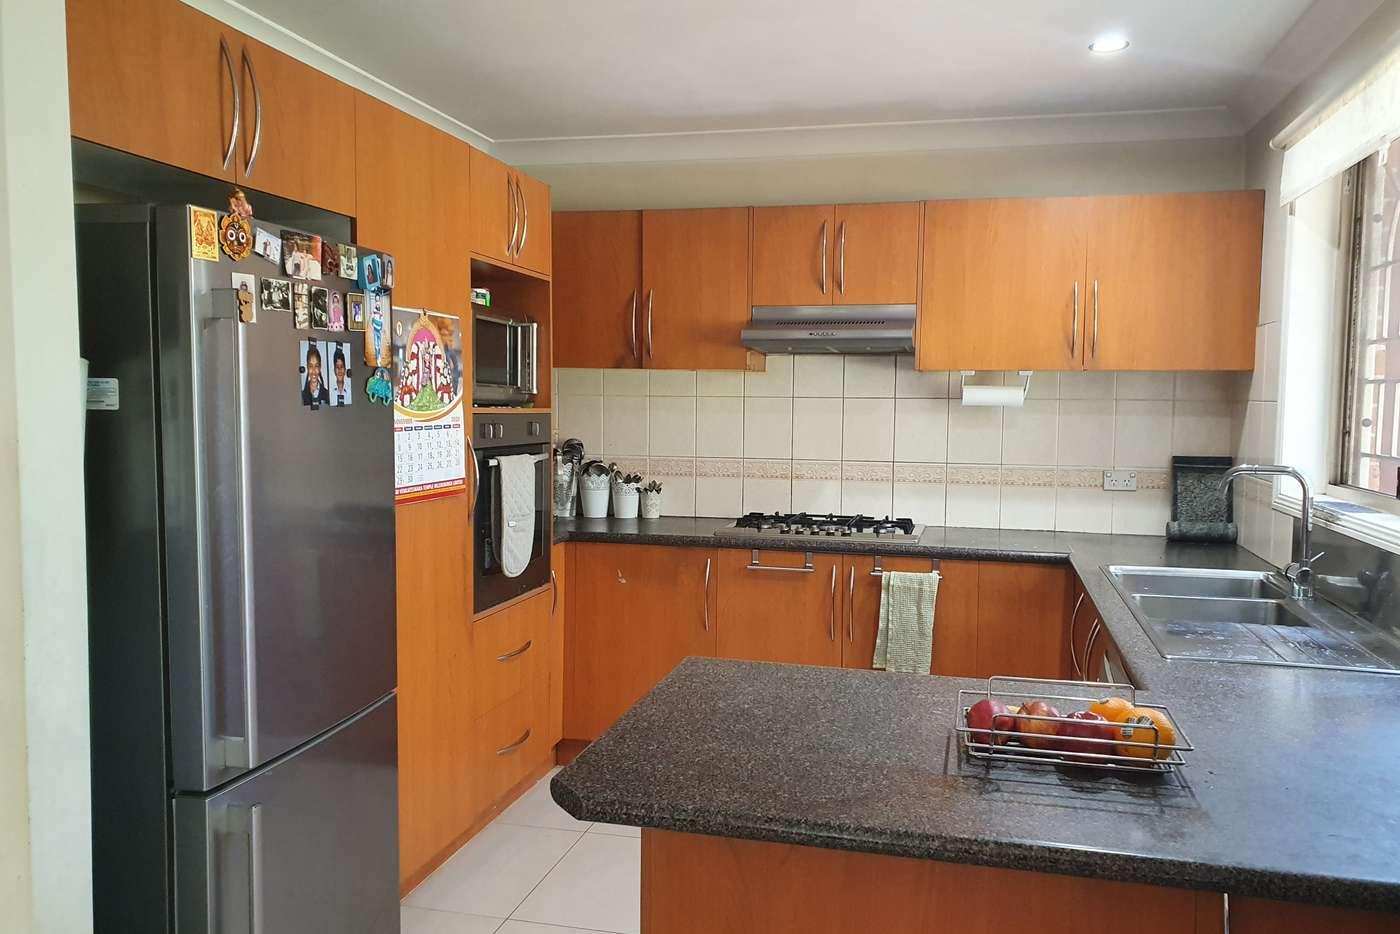 Main view of Homely house listing, 20 Purri Avenue, Baulkham Hills NSW 2153